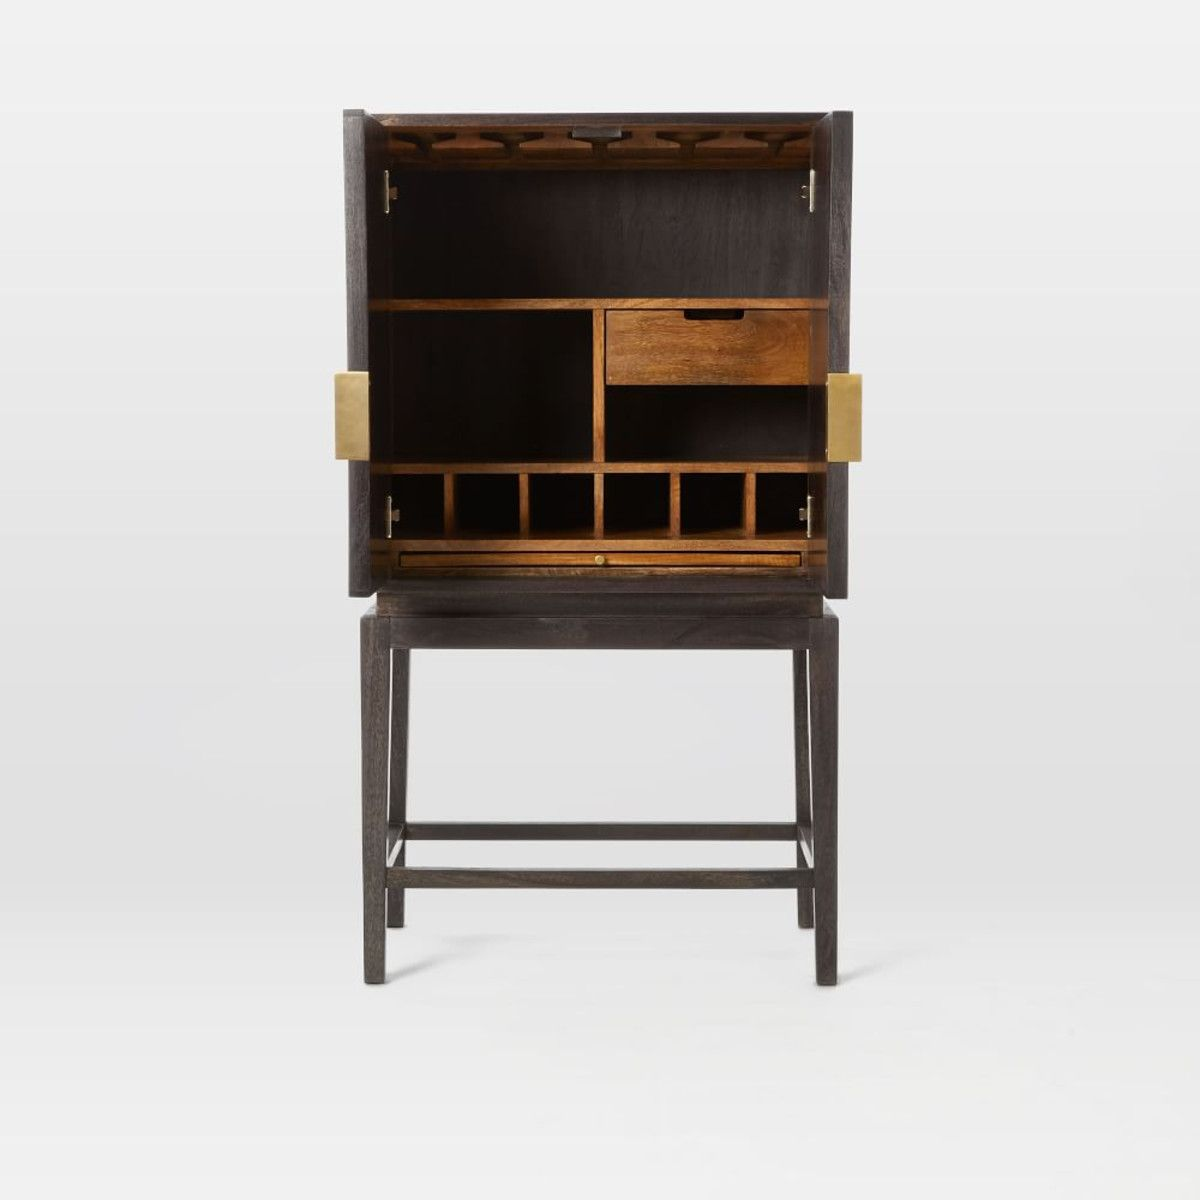 Bone Inlaid Bar Cabinet / west elm | Bar cabinets | Pinterest | Bar ...